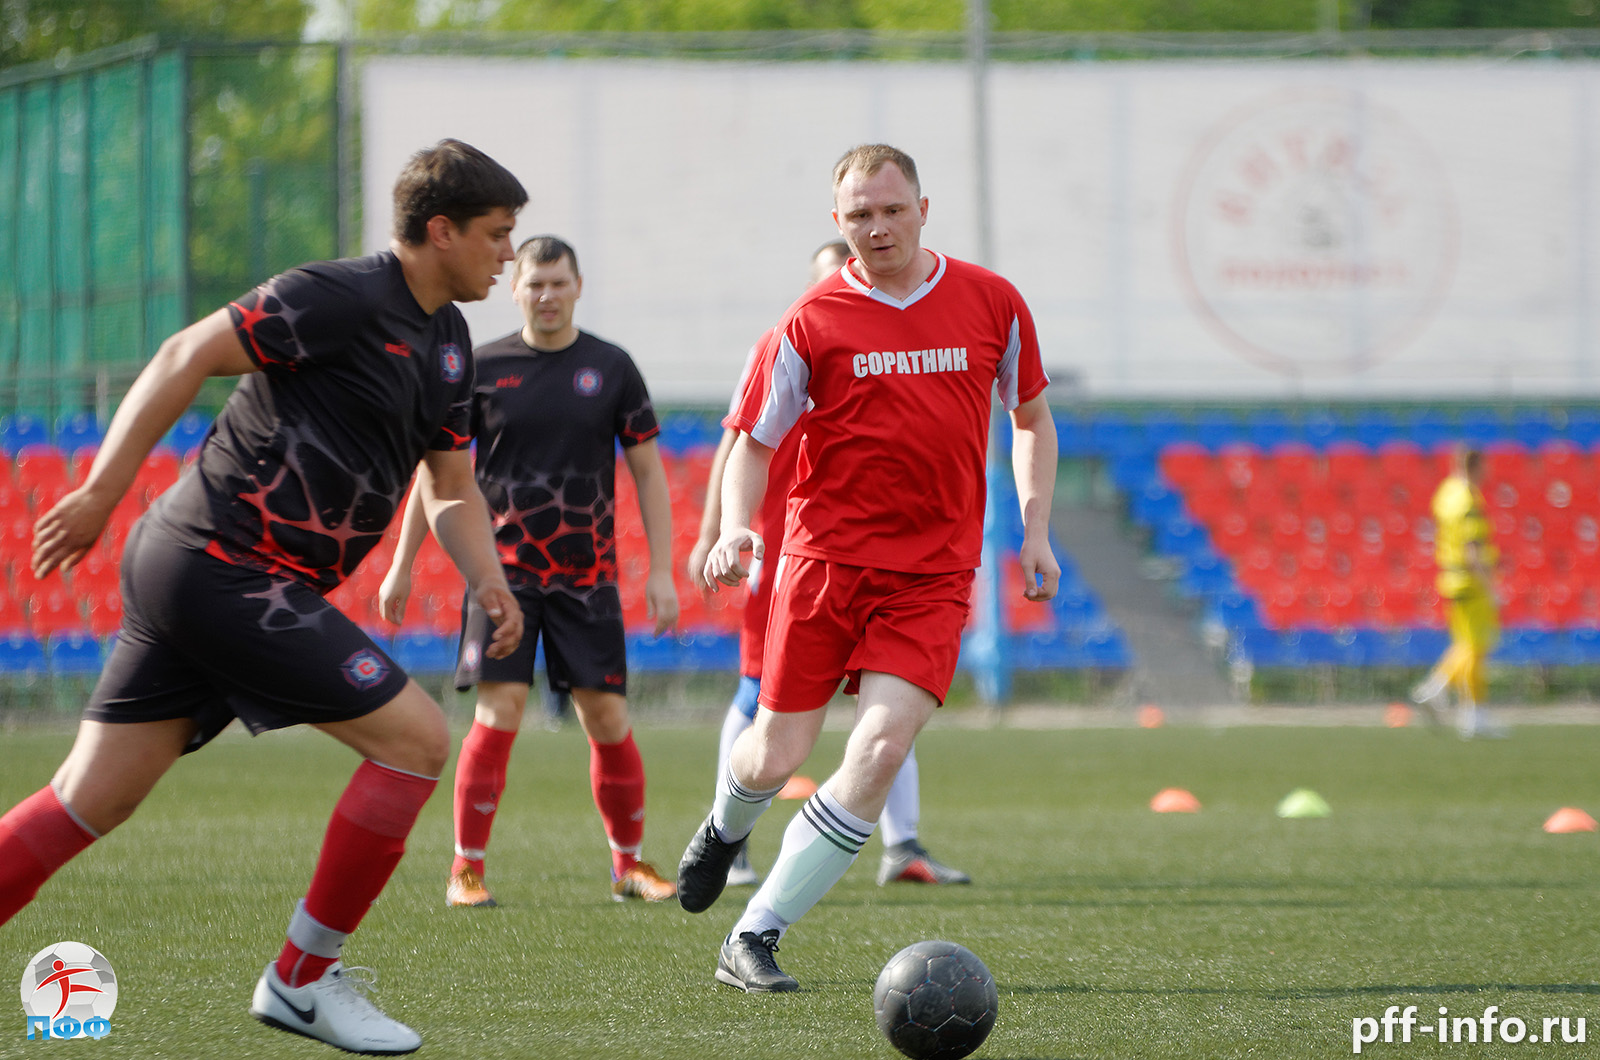 Премьер-лига ТДК. Обзор 8 тура